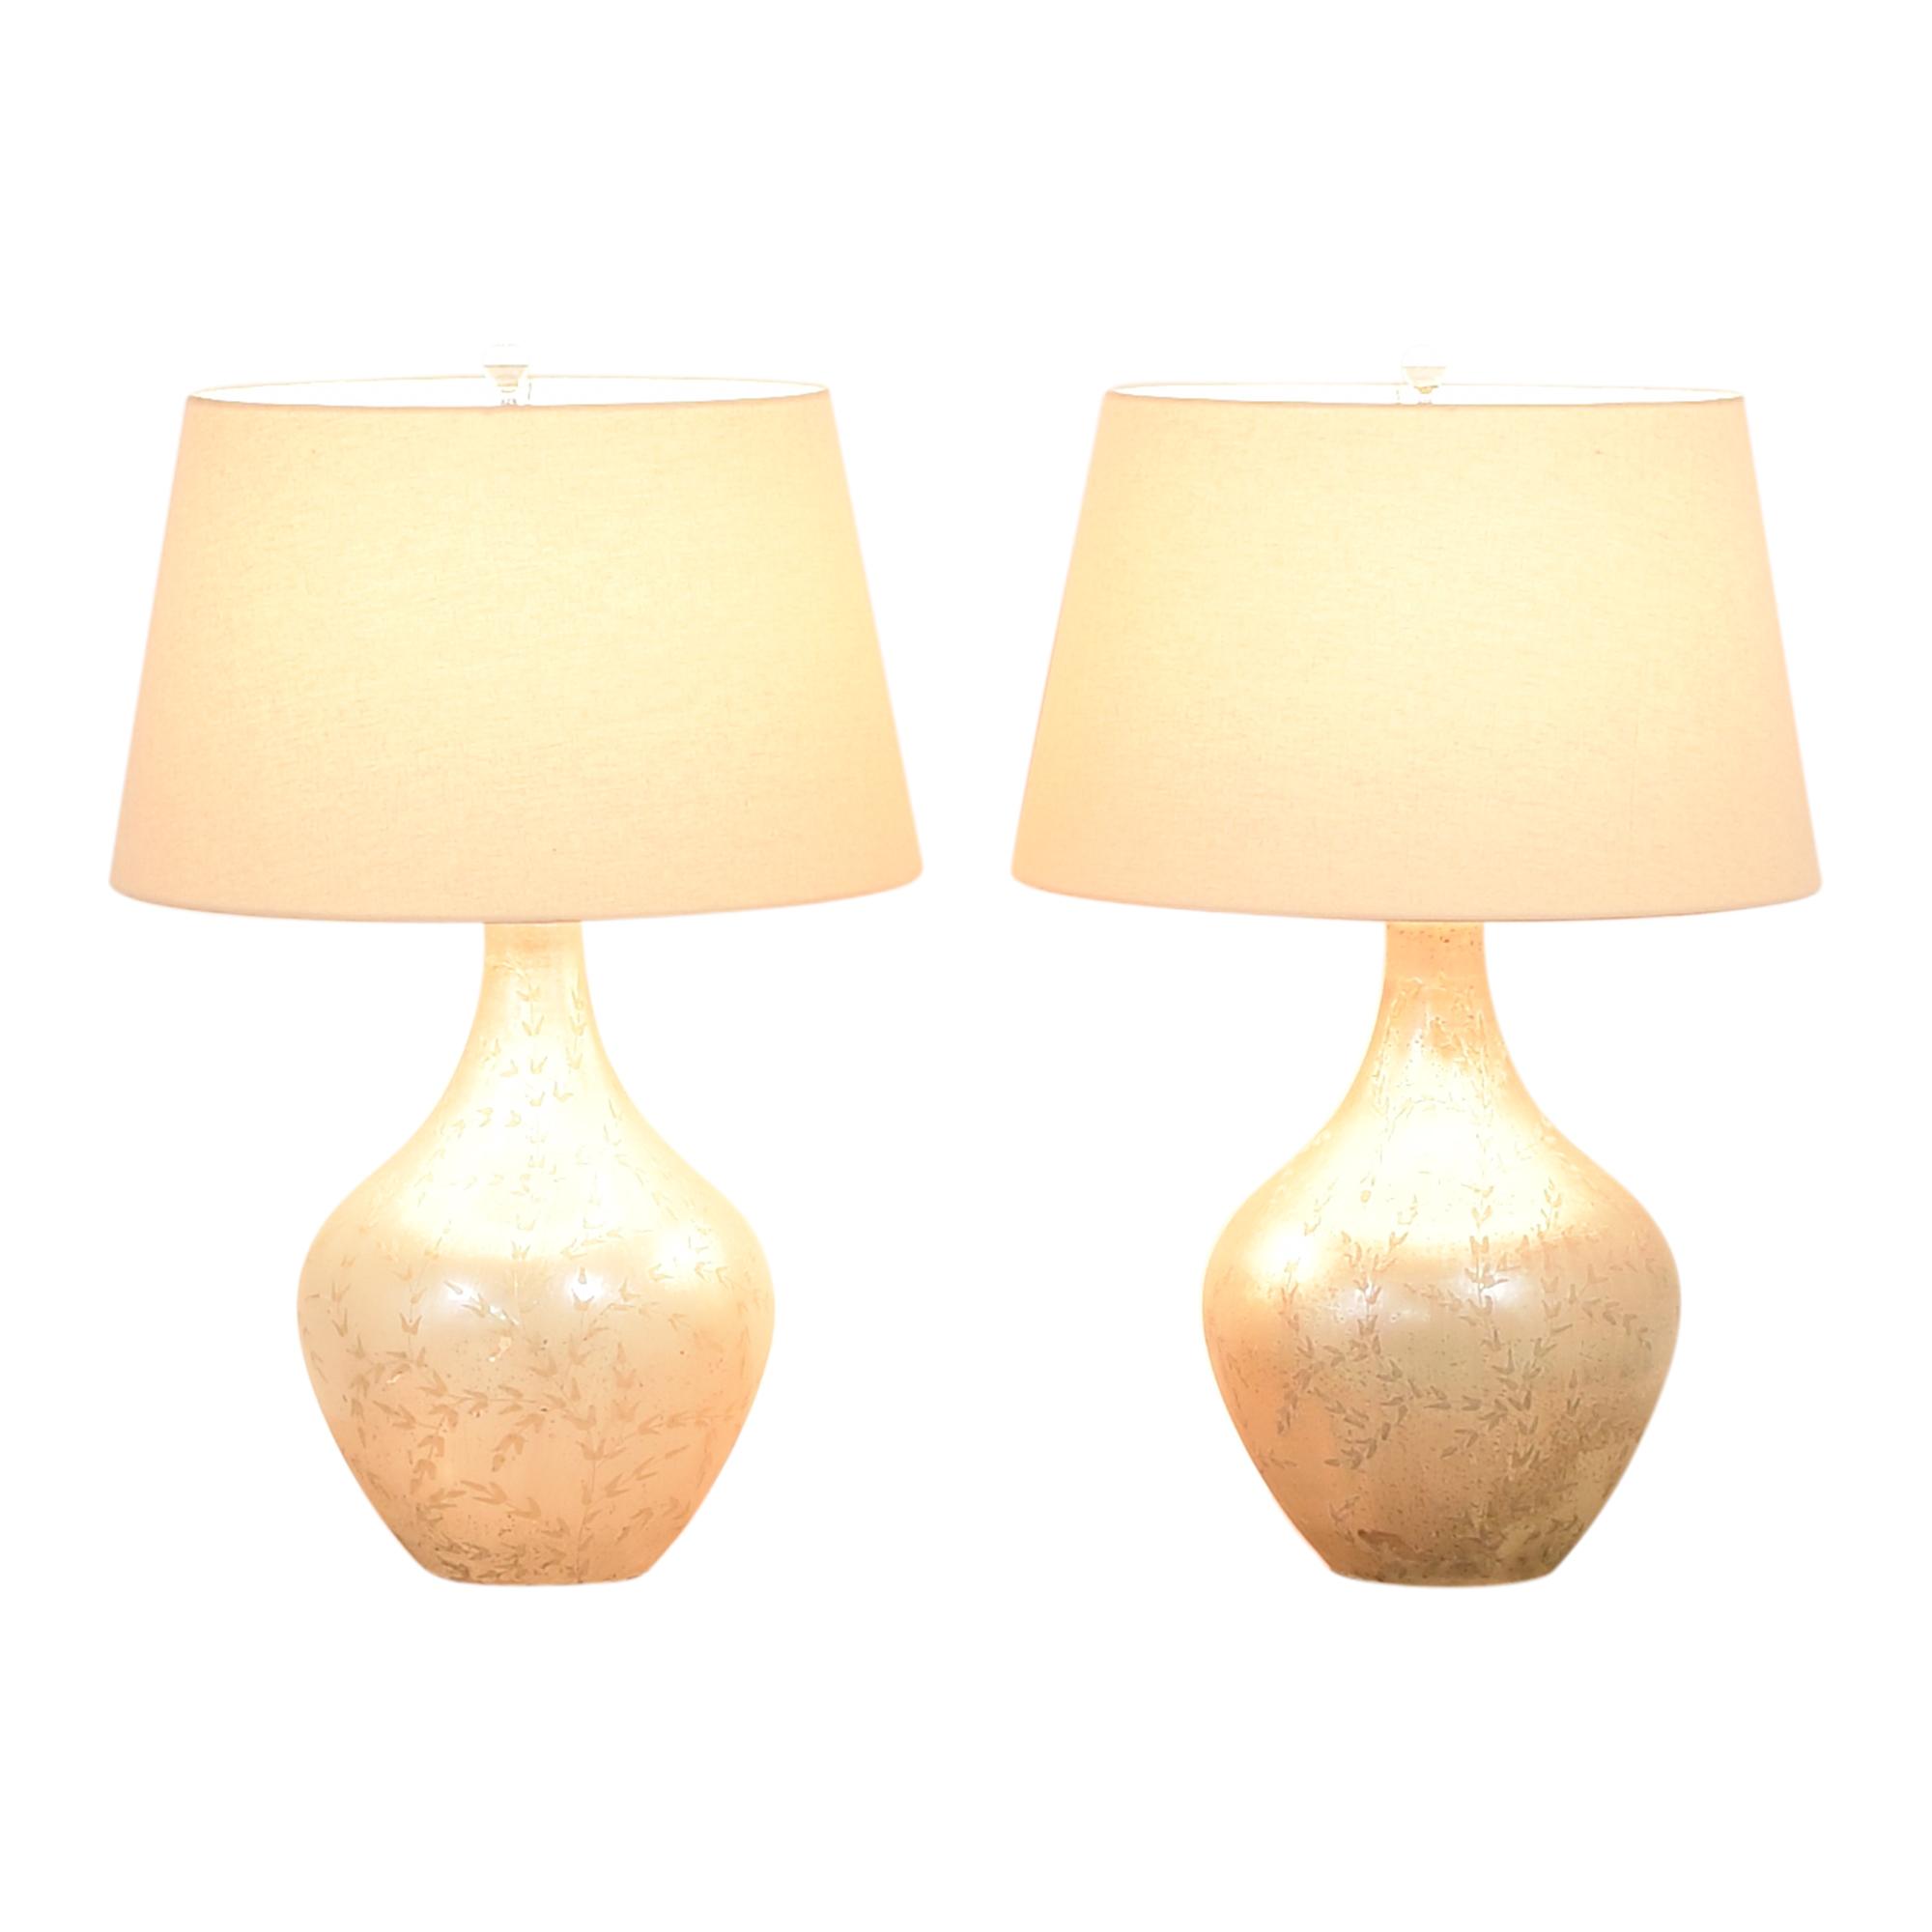 shop Tanner & Kenzie Bedside Table Lamps Tanner & Kenzie Decor